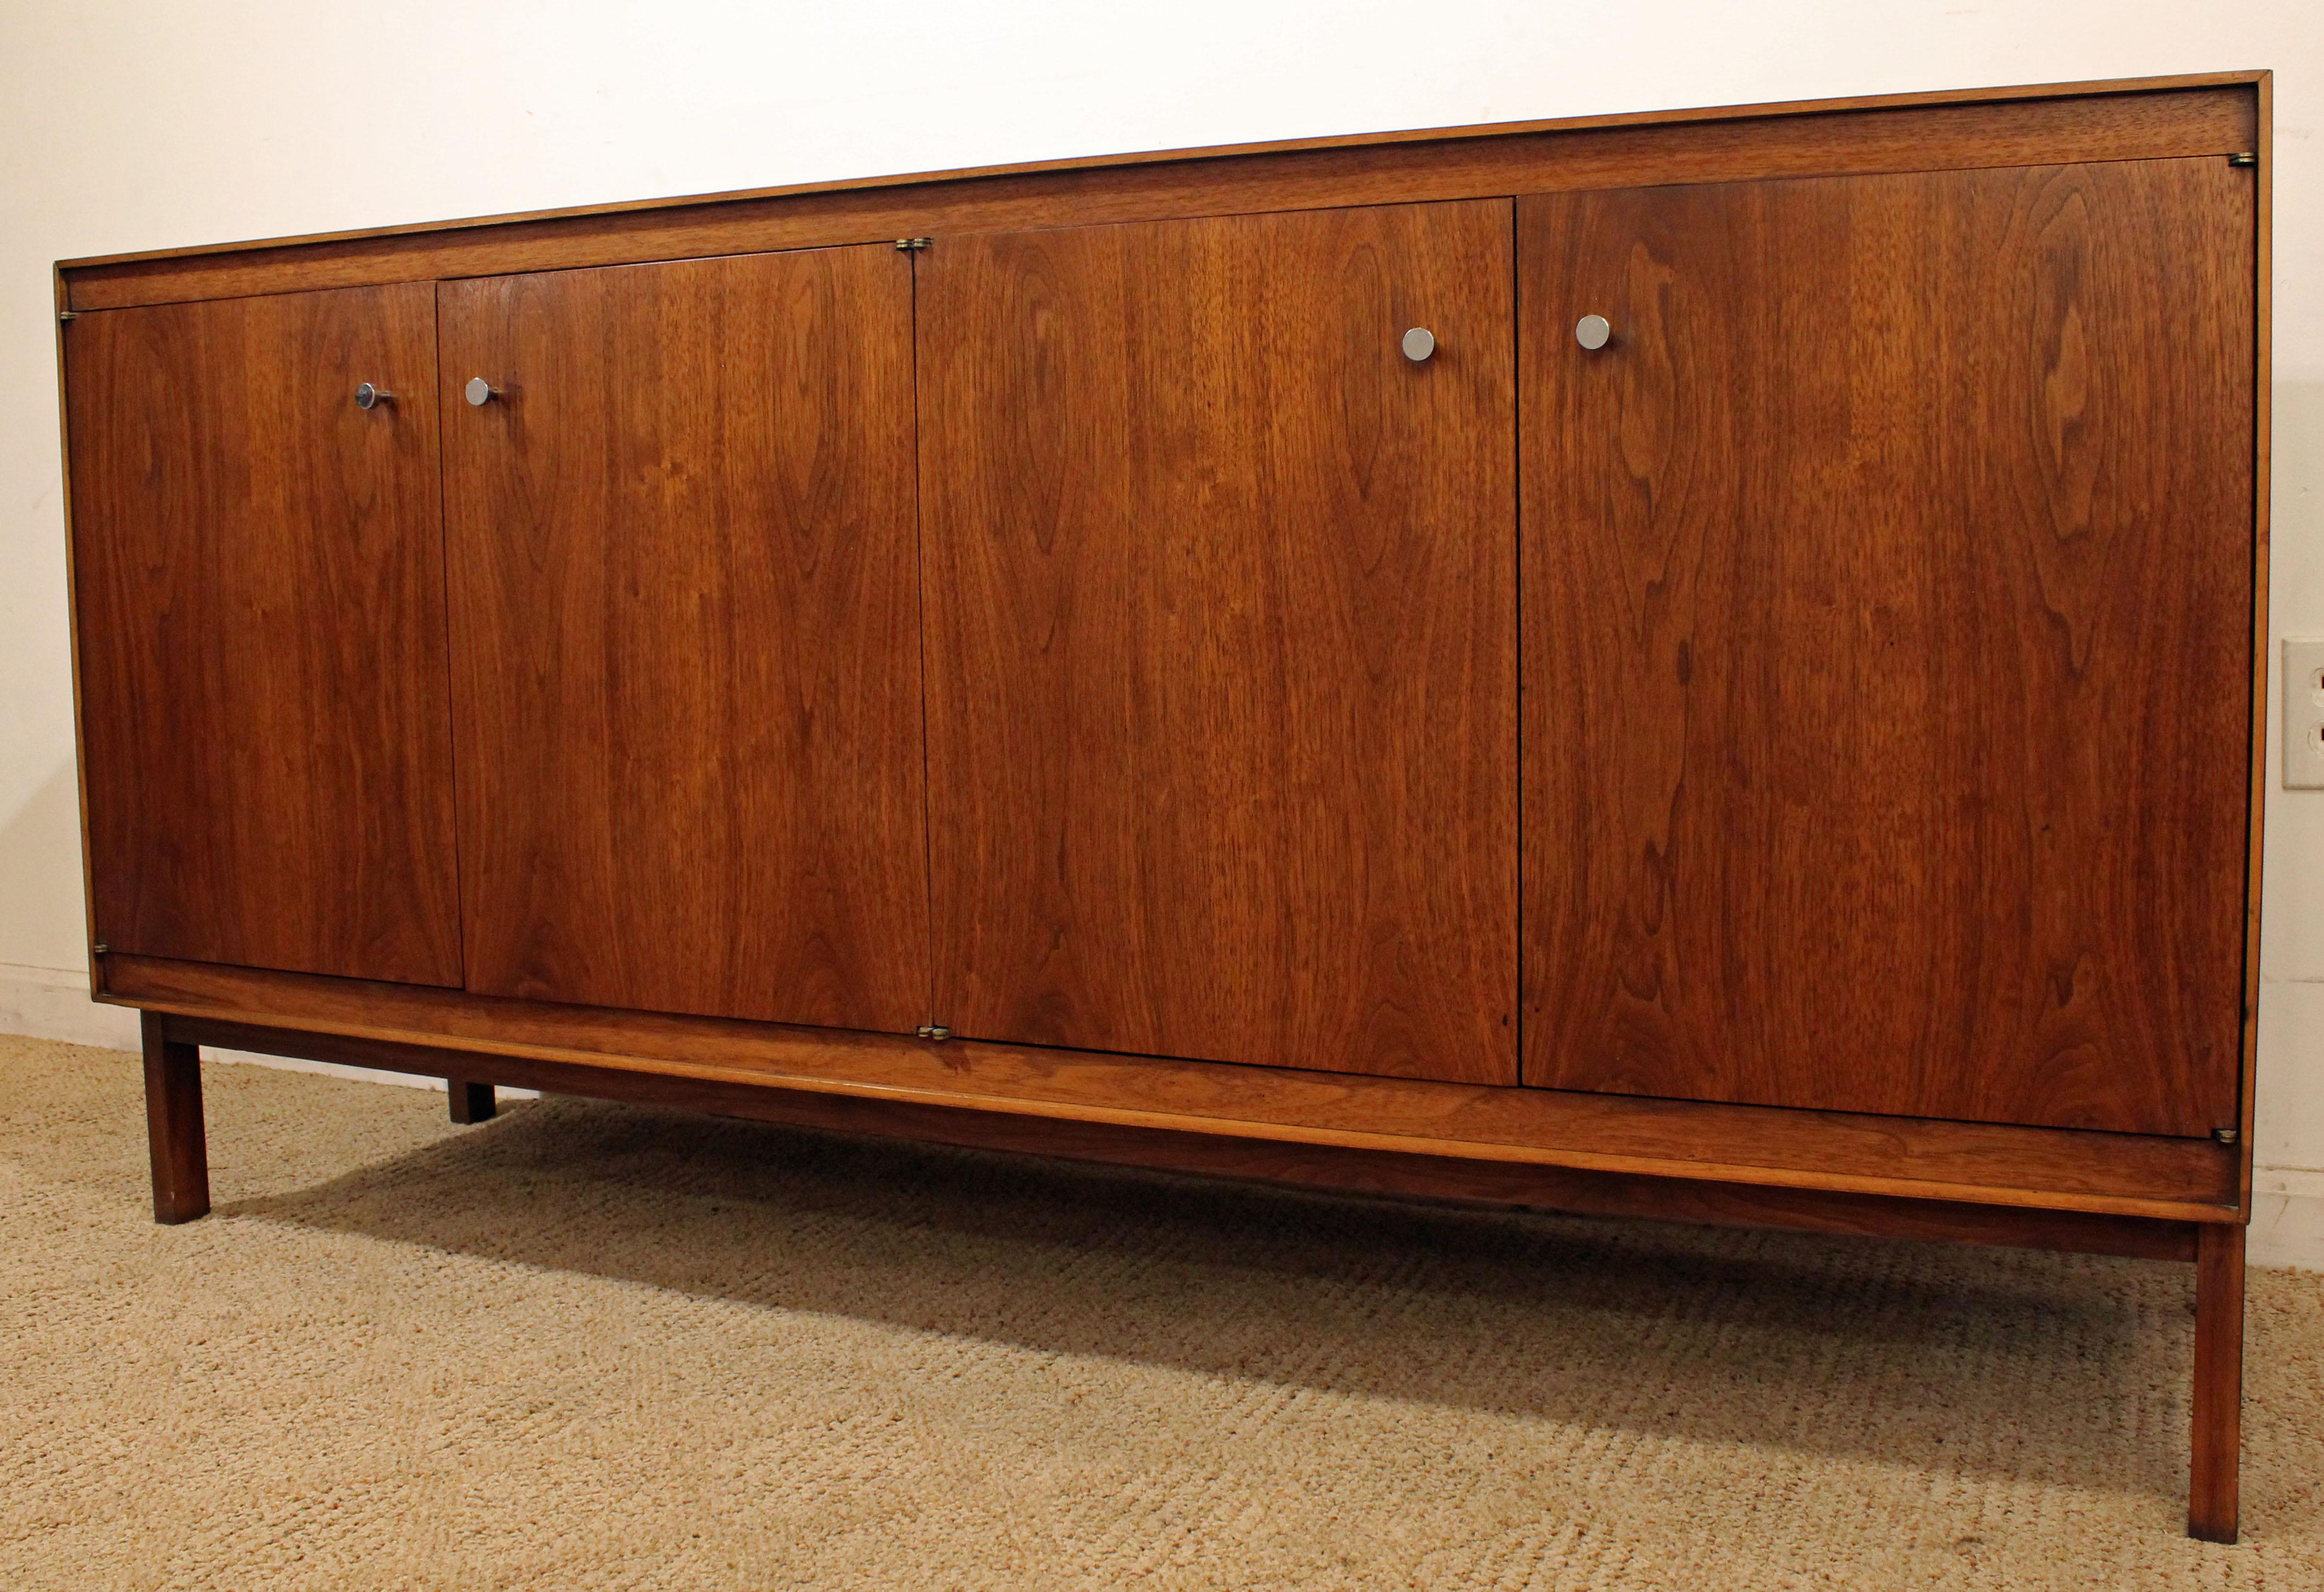 Danish Modern Credenza For Sale : Mid century danish modern paul mccobb components walnut credenza